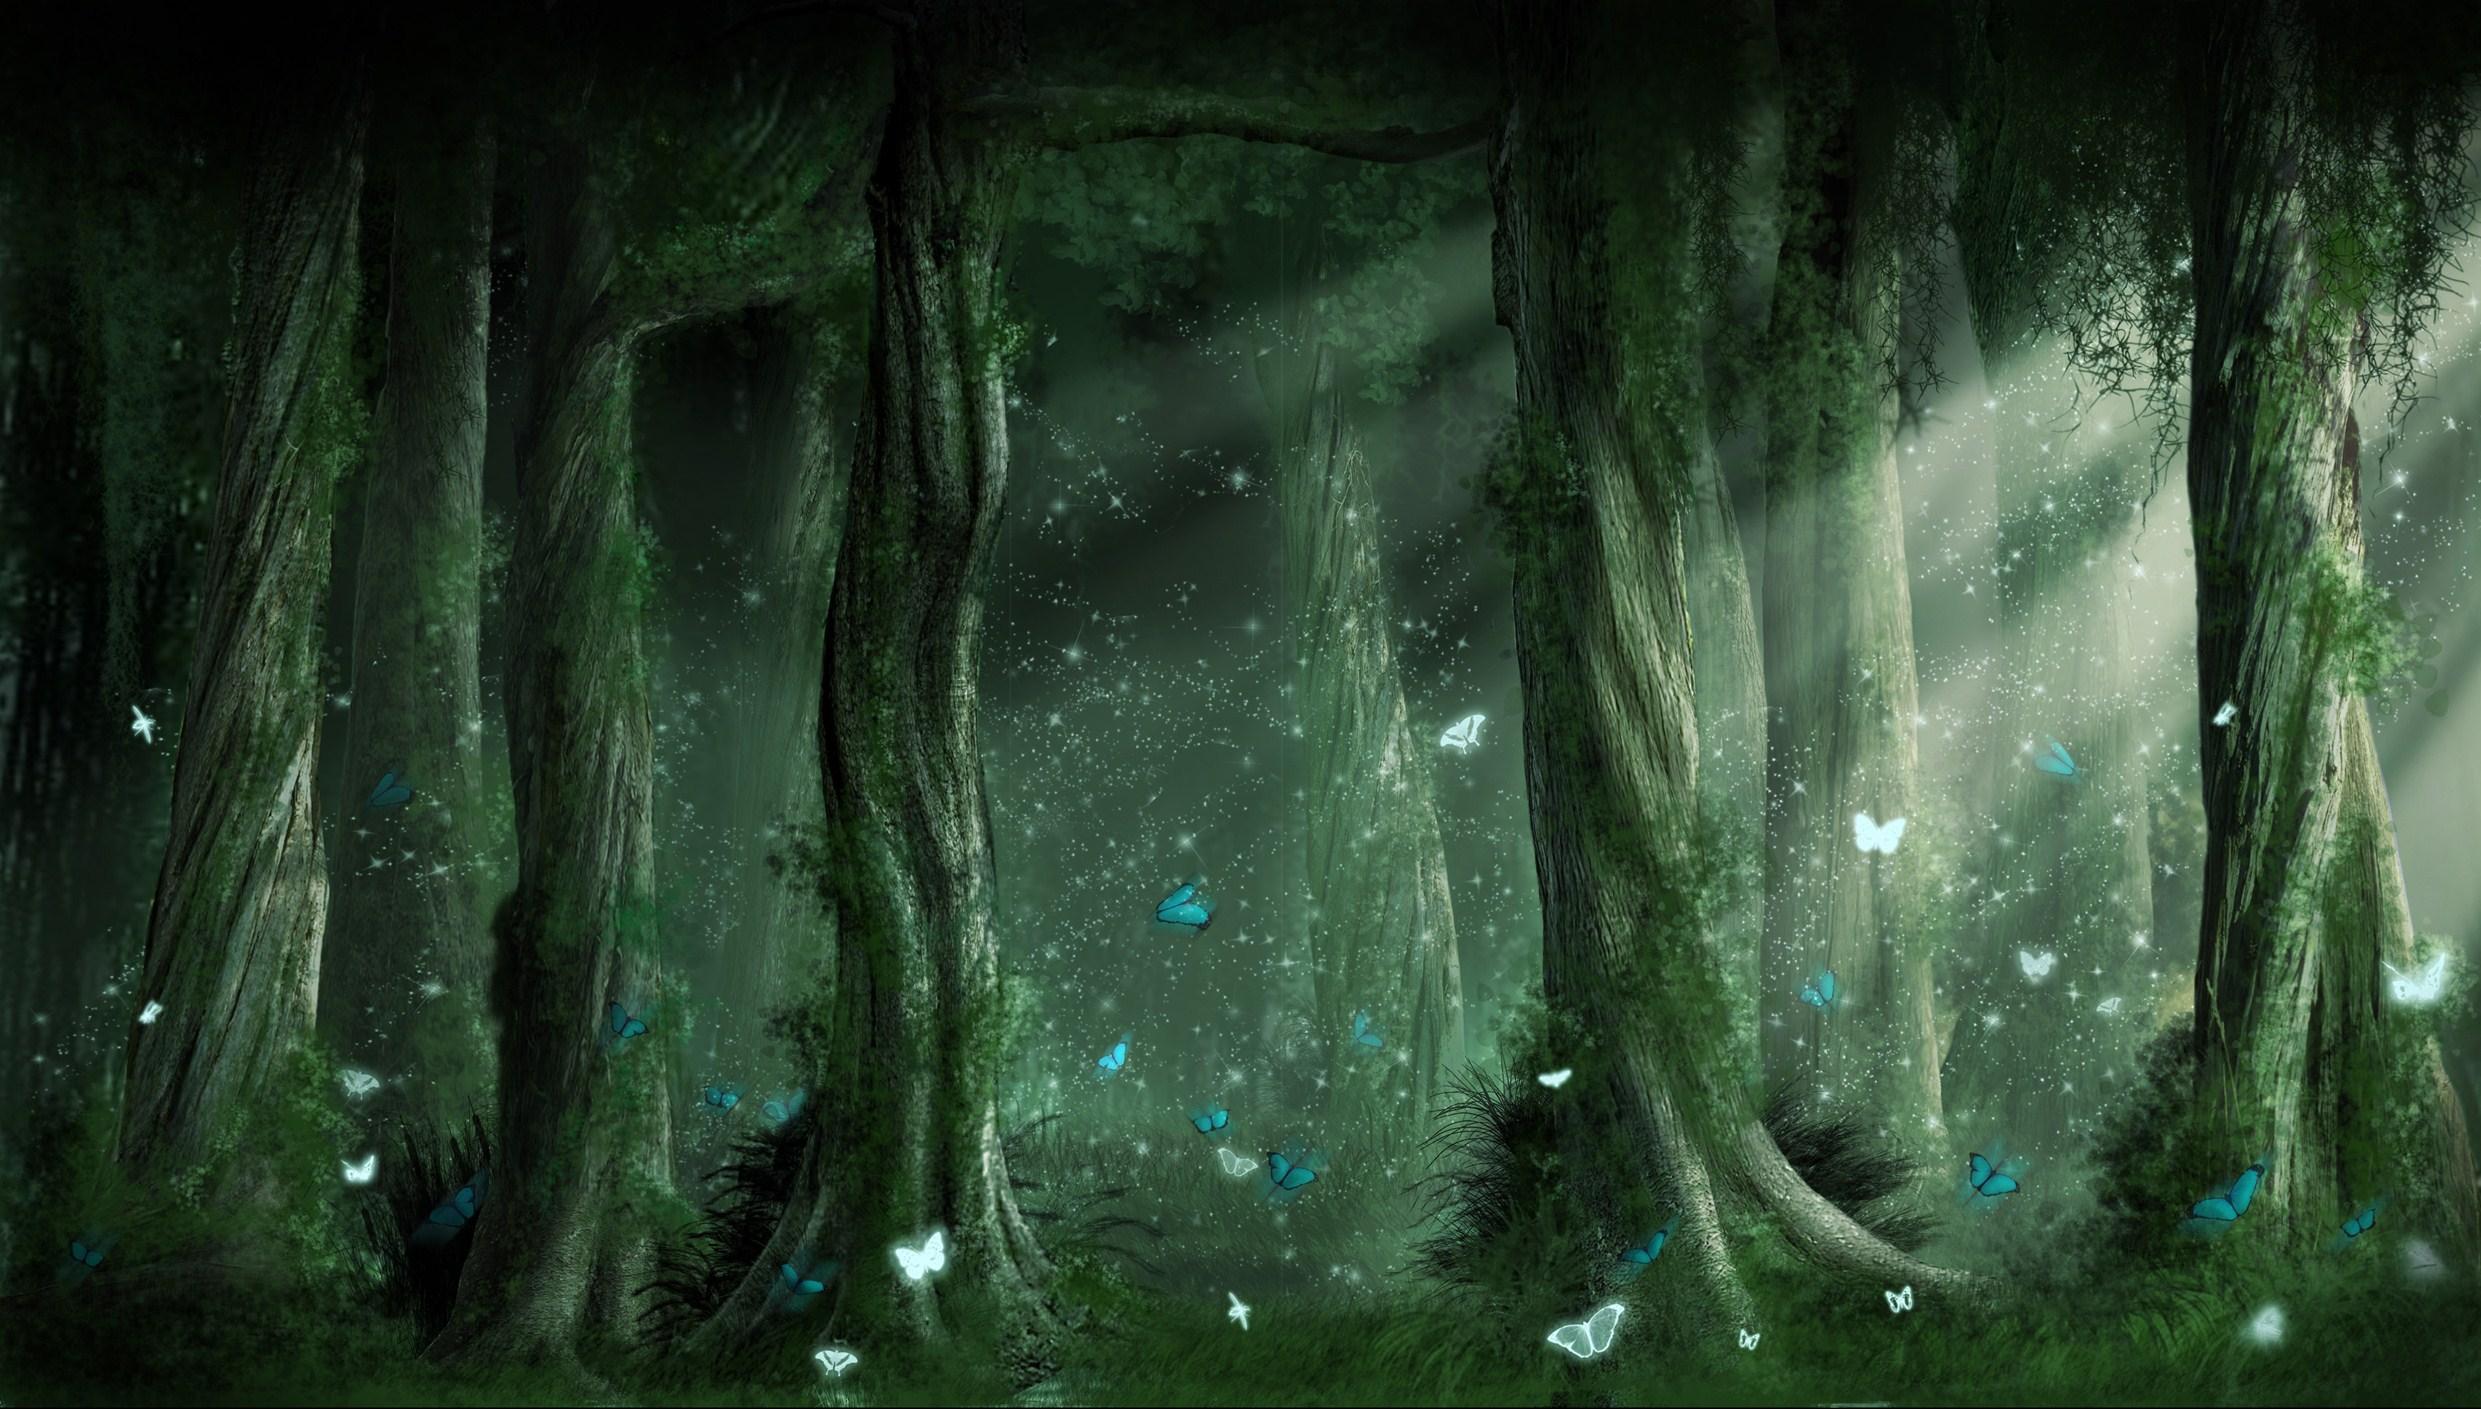 Forest Fantasy Background 18575 2481x1409 Px